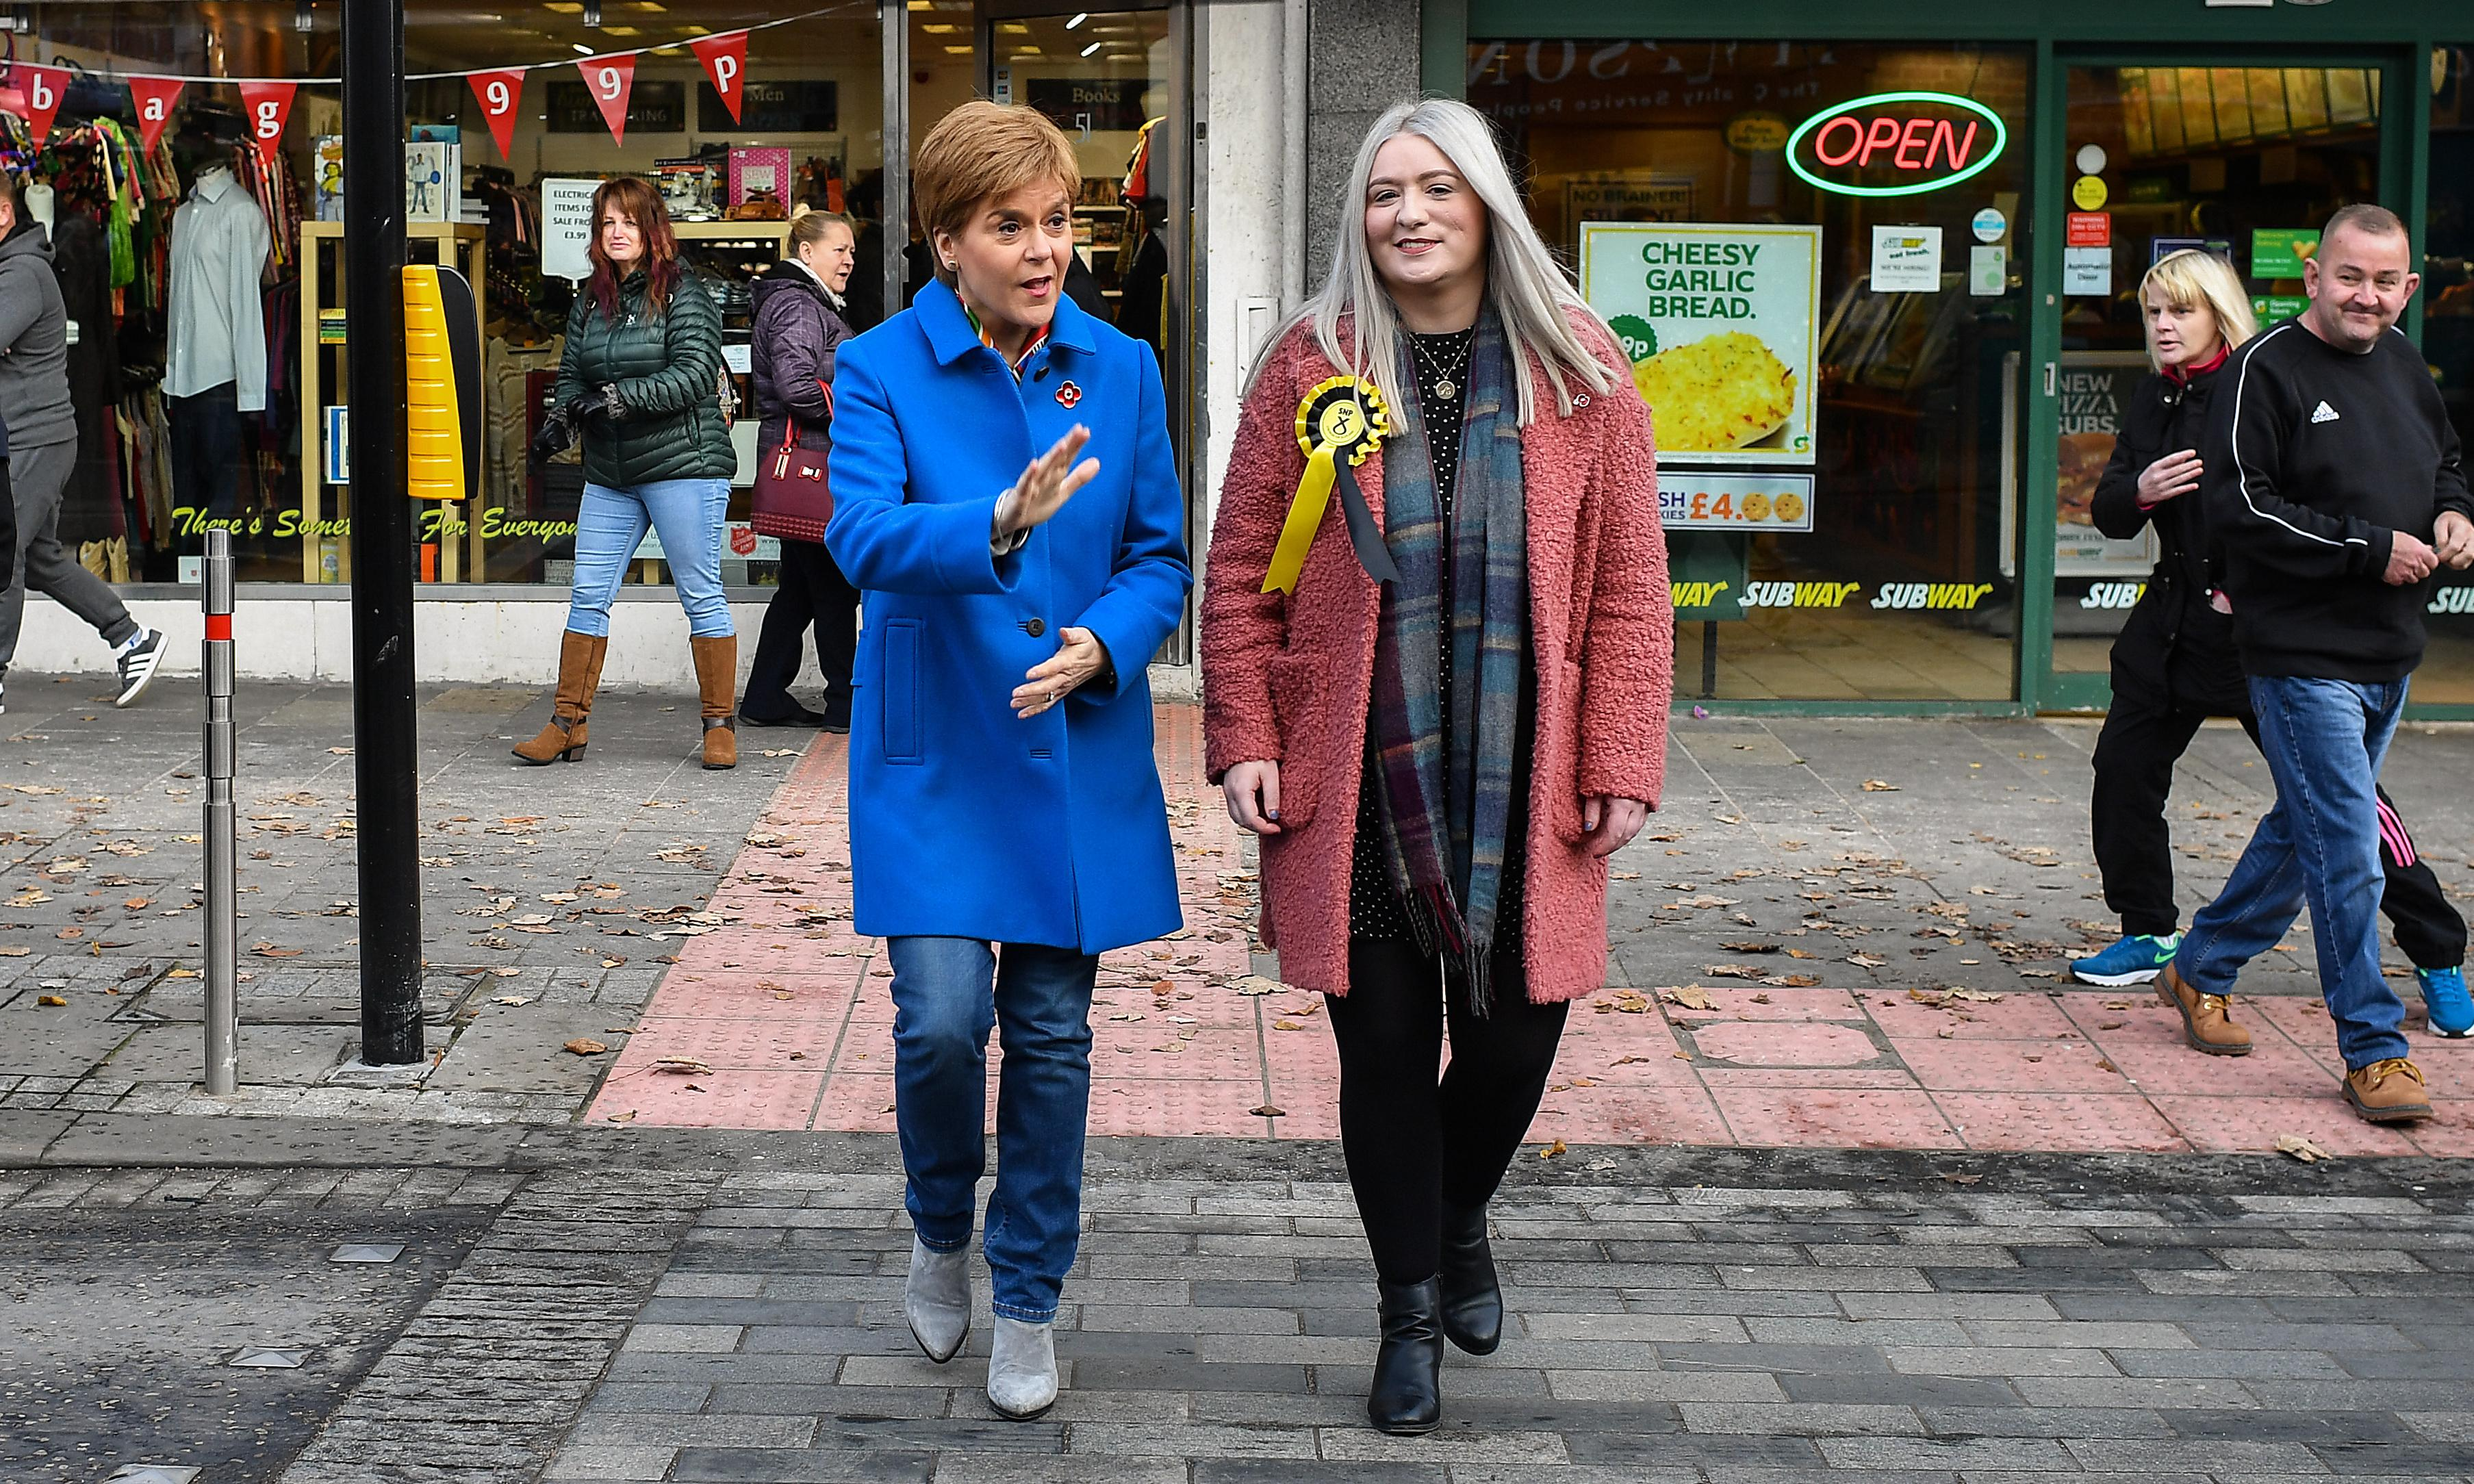 'Quietly confident': SNP talks up chances in Jo Swinson's seat